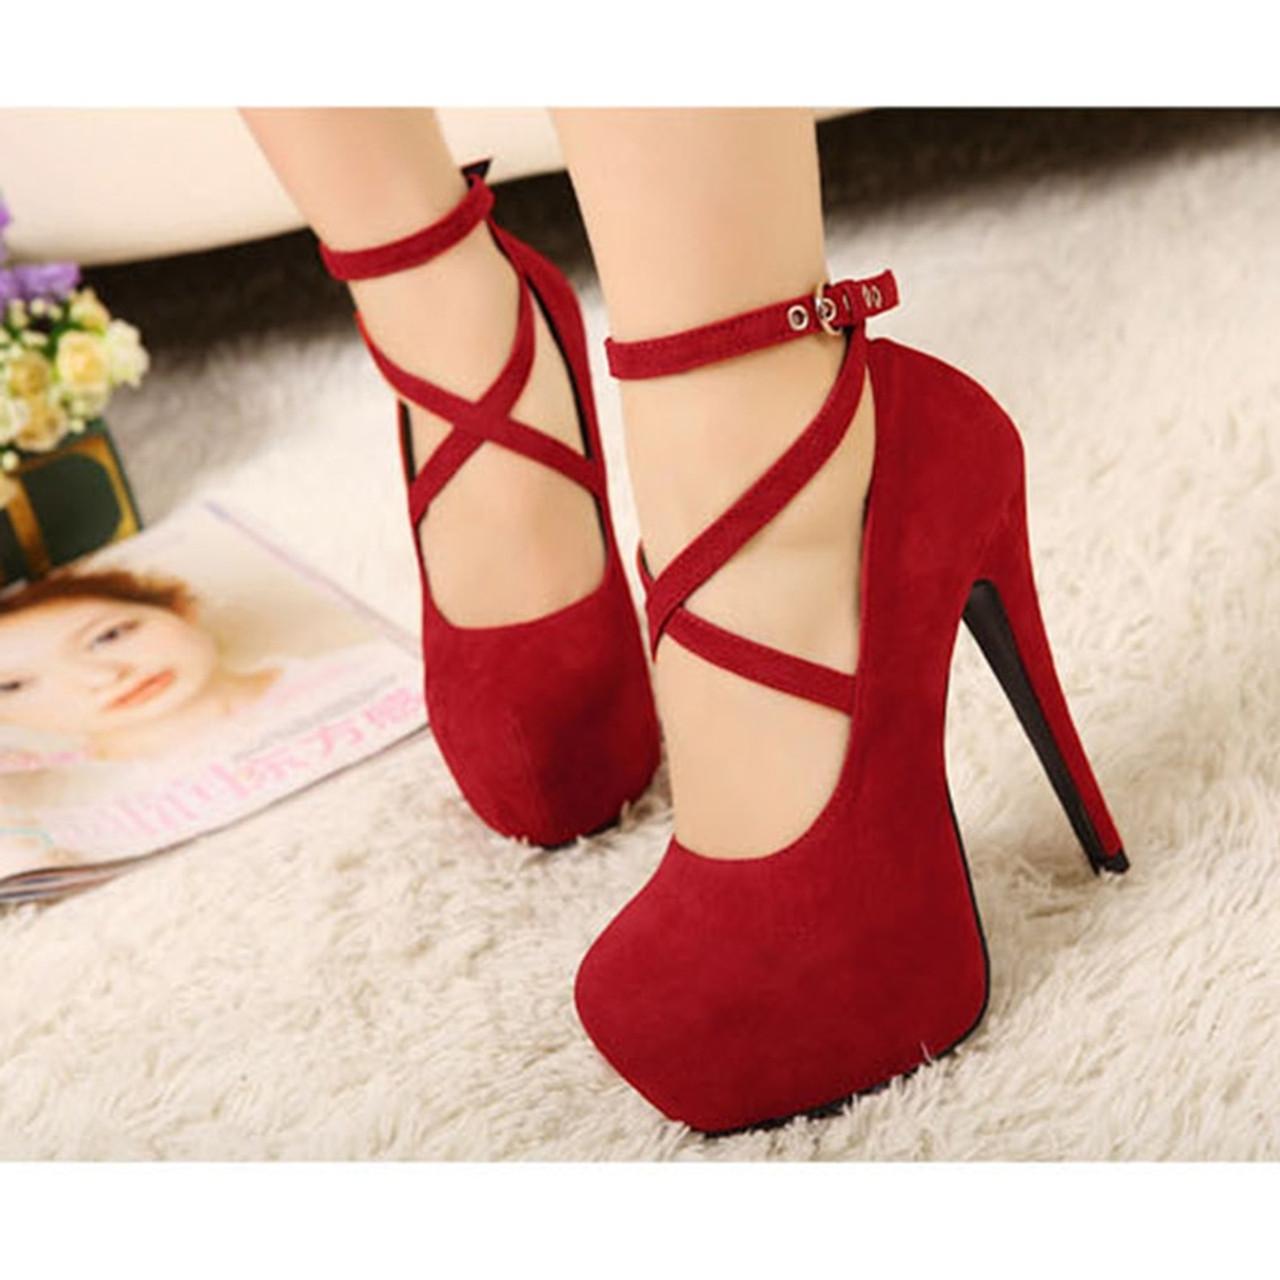 Hot Fashion New high-heeled shoes woman